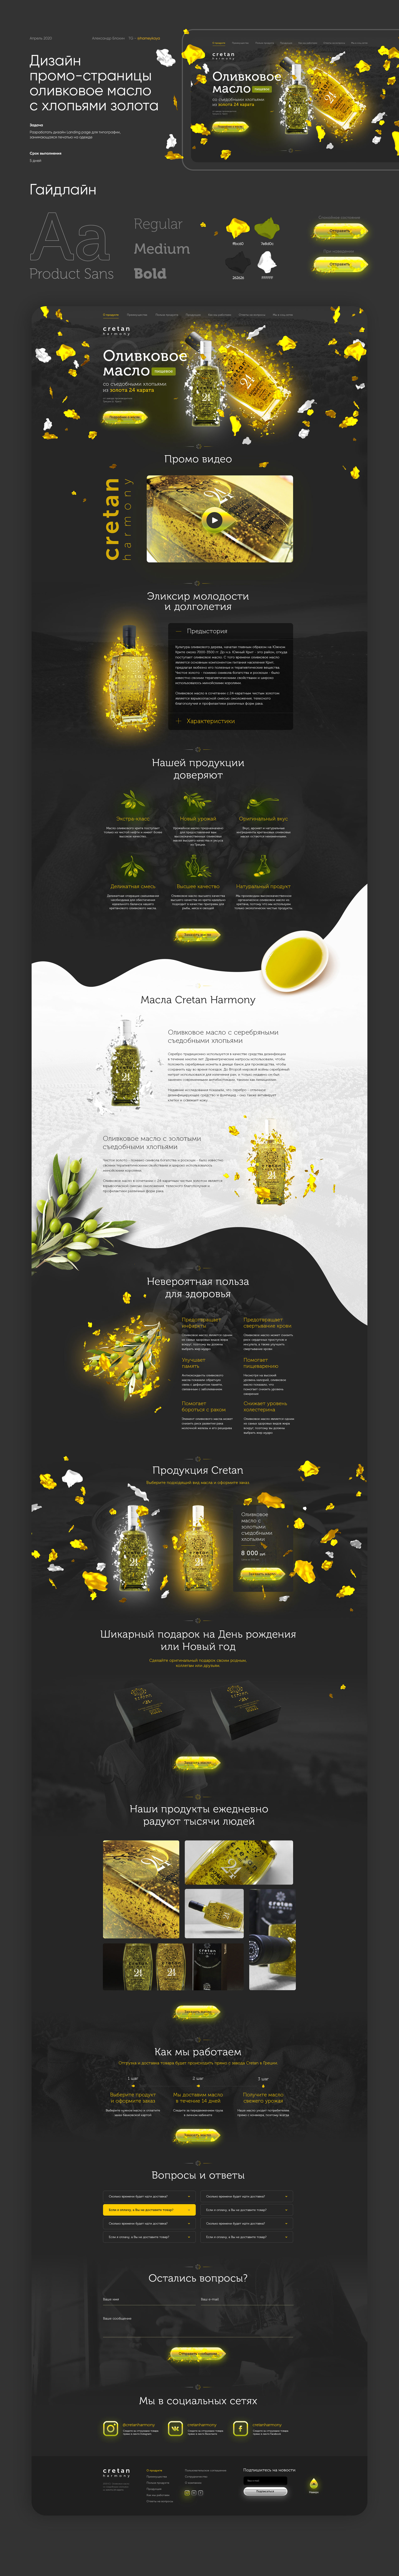 Оливковое масло с золотыми хлопьями / Olive oil with gold flakes